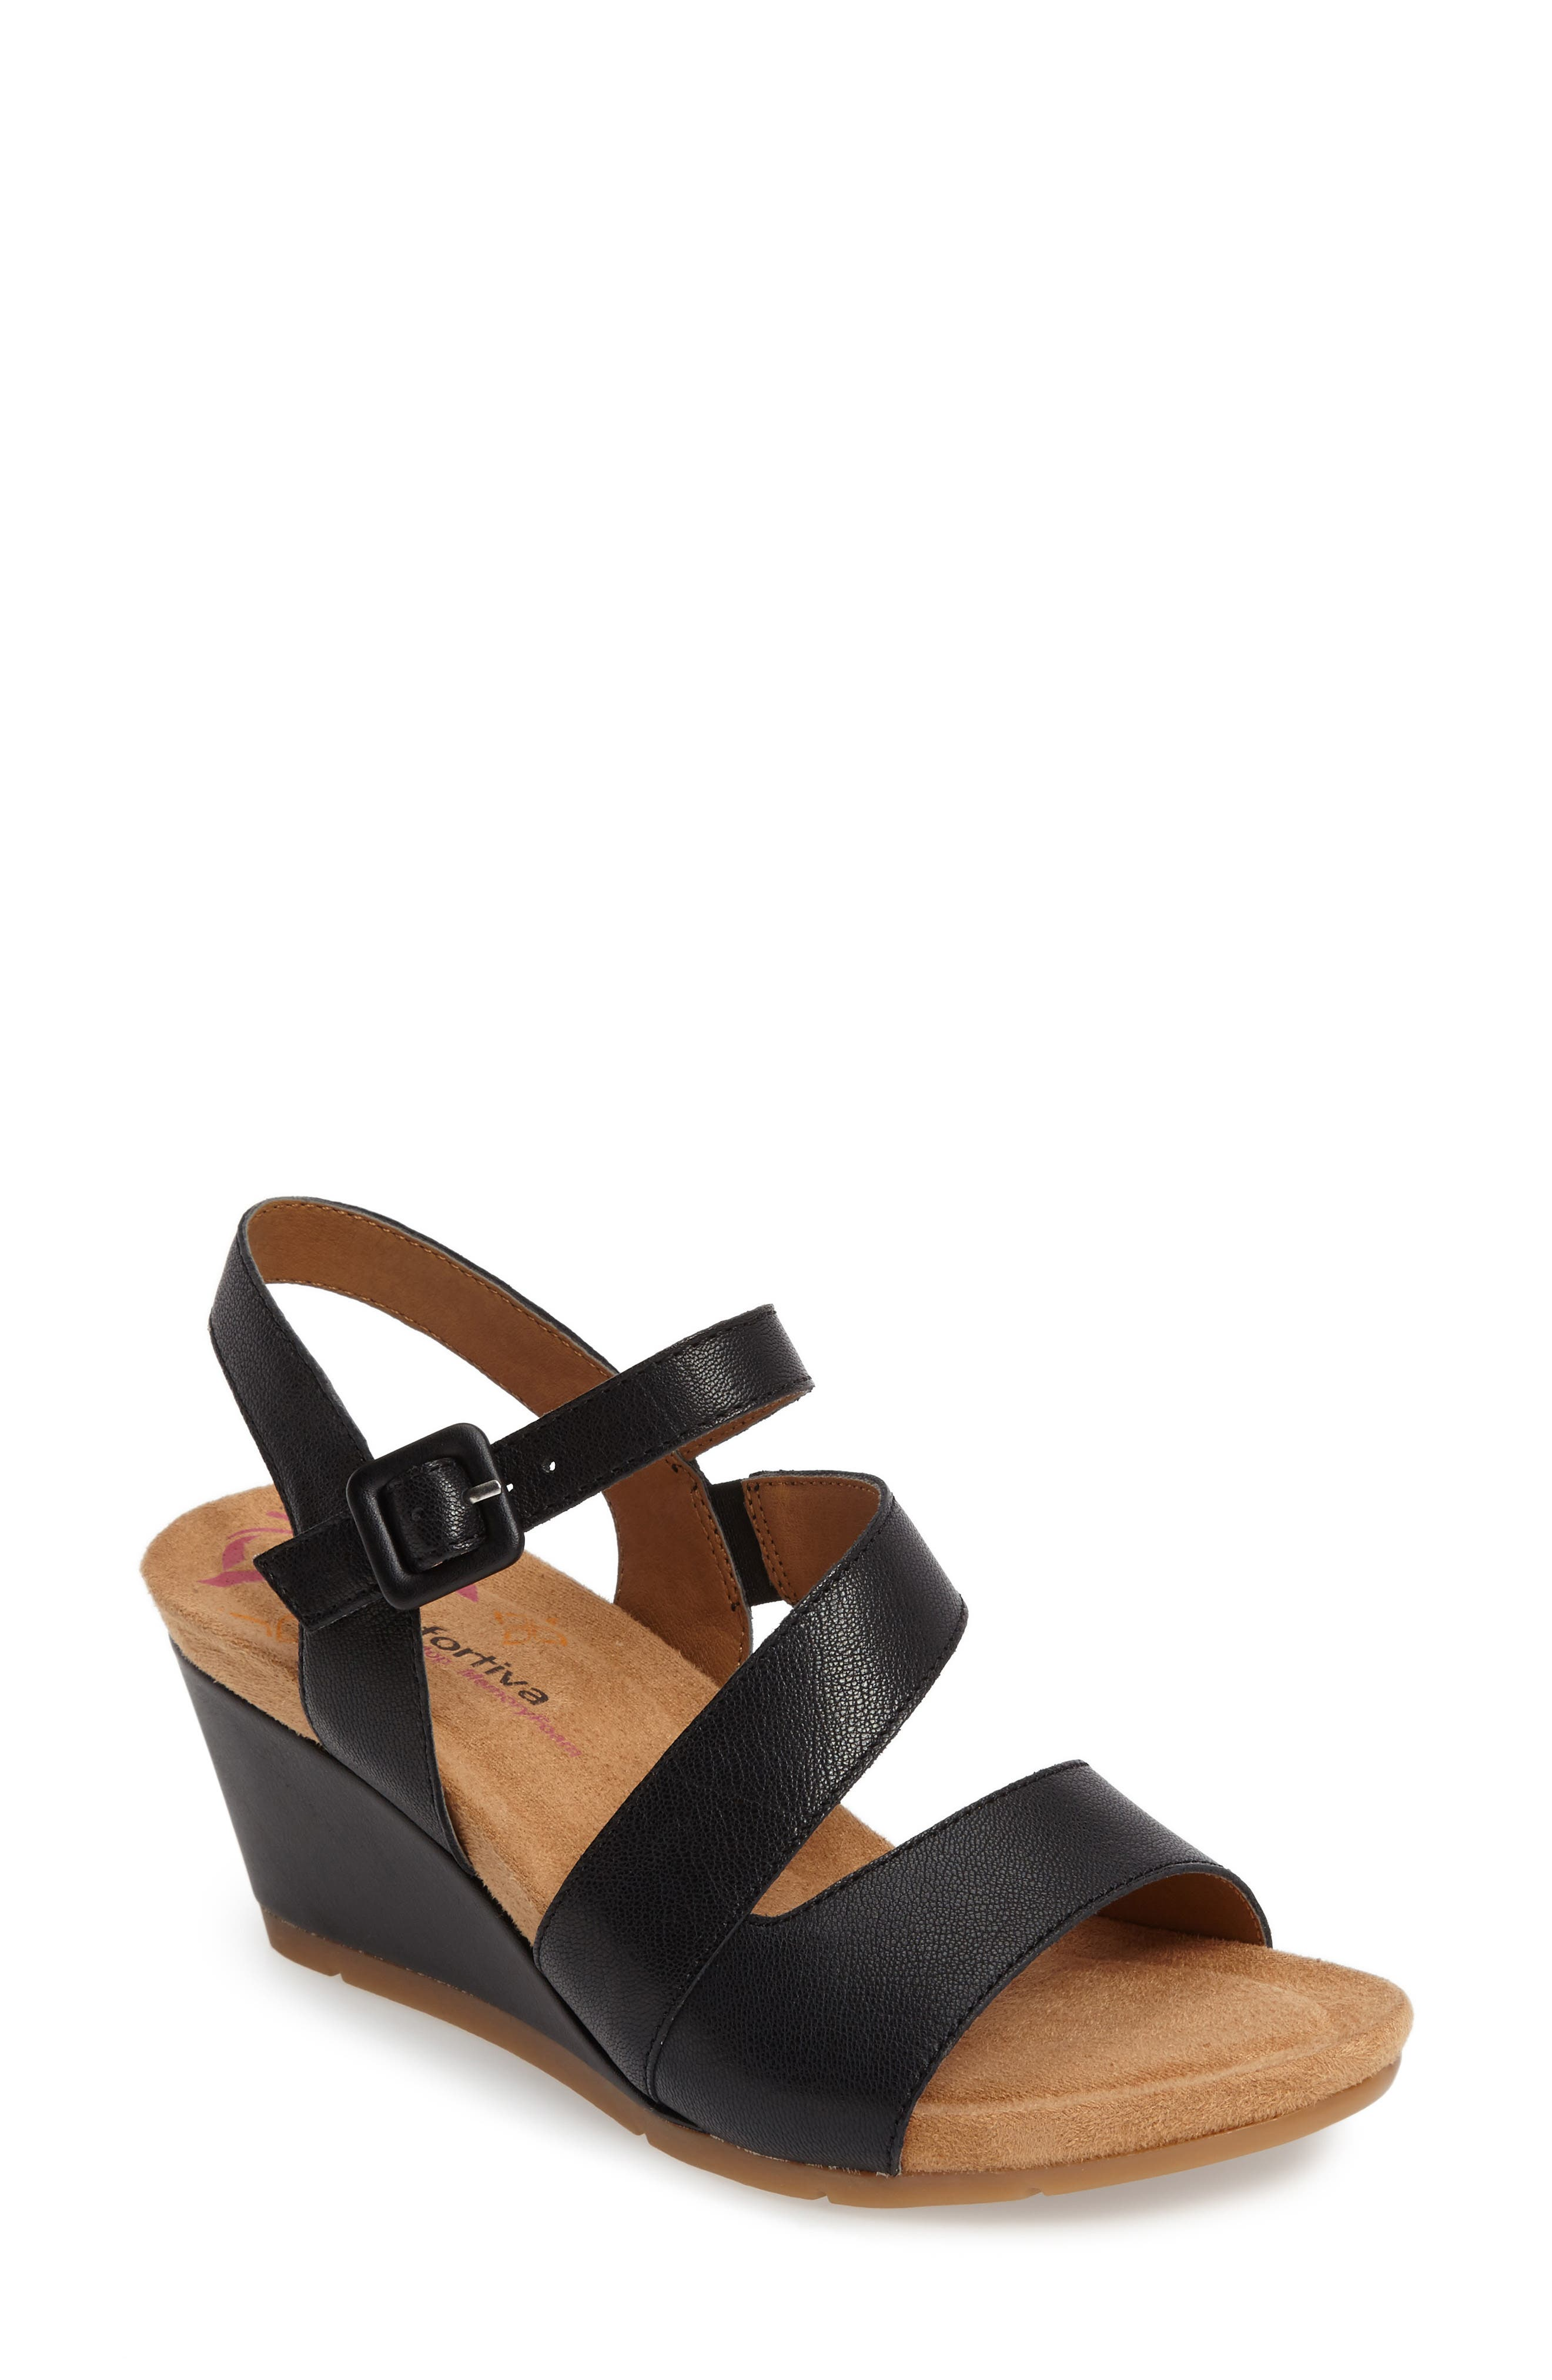 Alternate Image 1 Selected - Comfortiva Violet Wedge Sandal (Women)